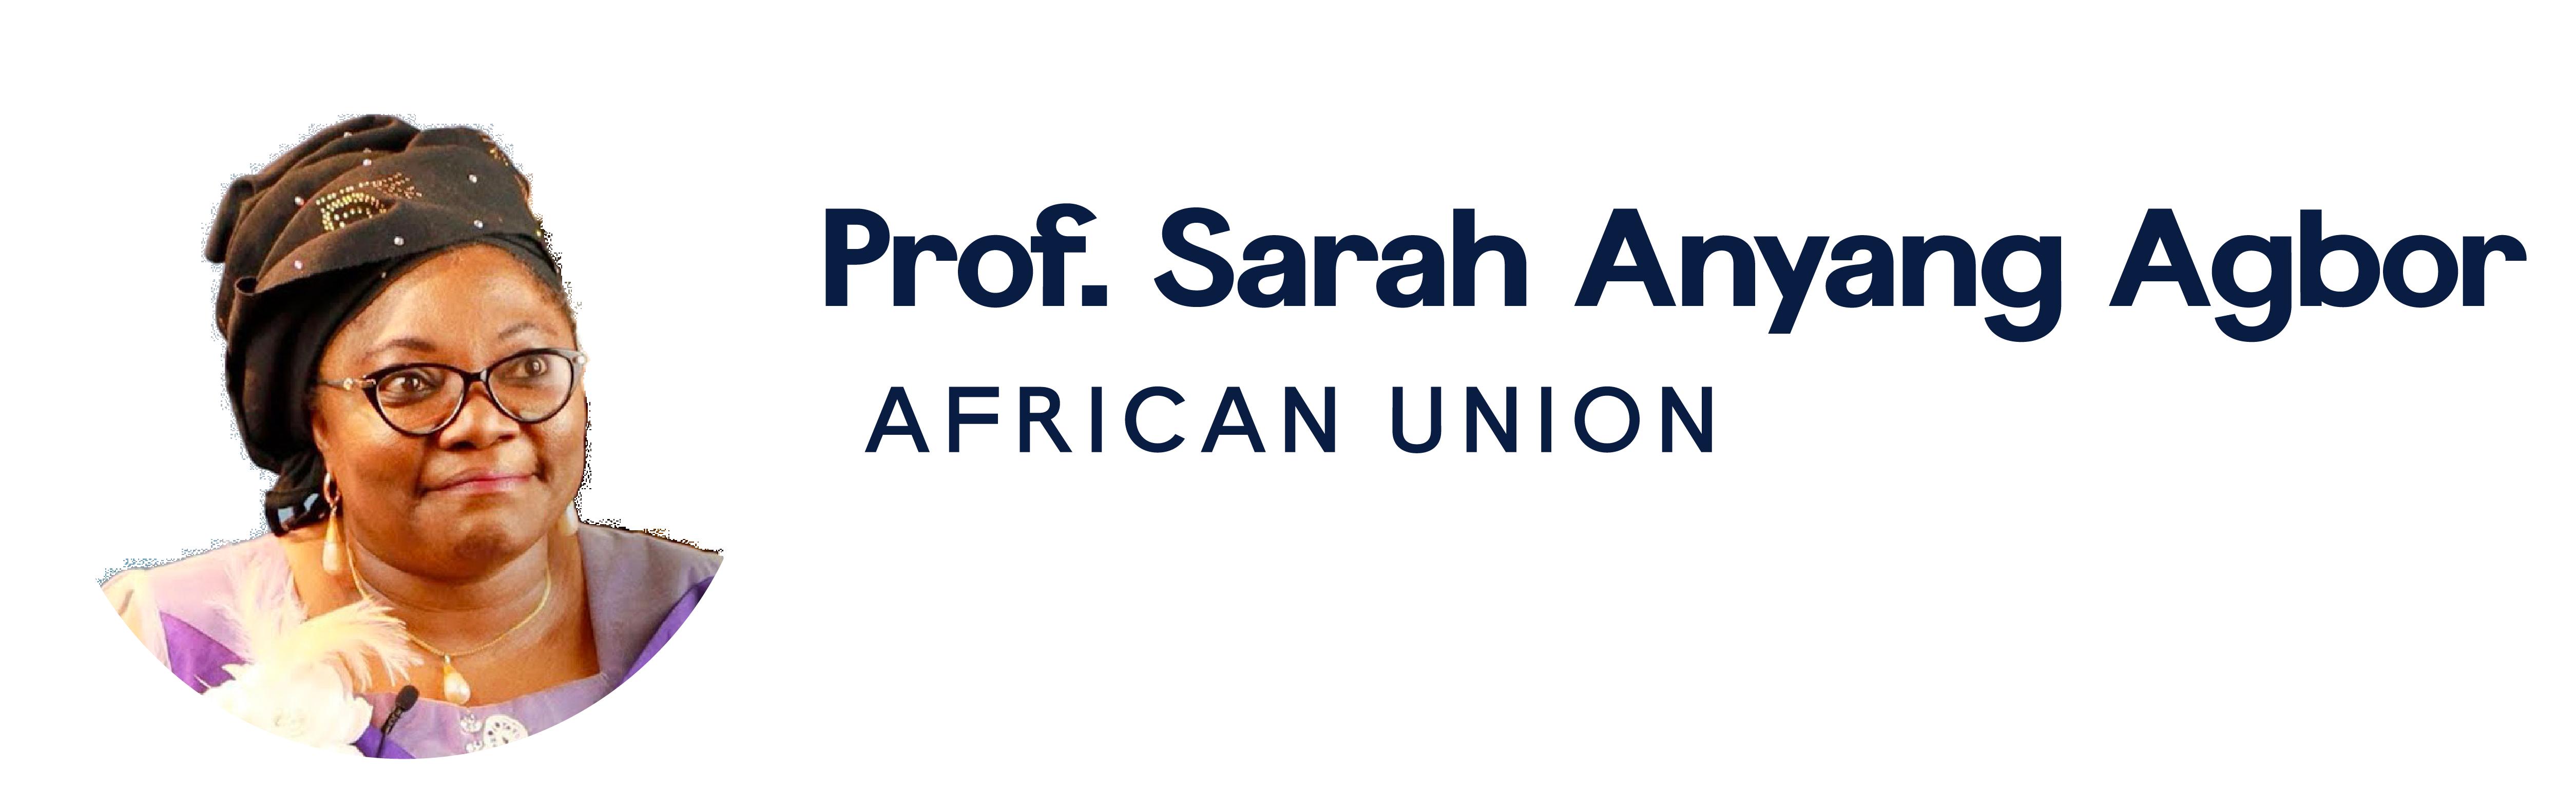 Prof. Sarah Anyang Agbor_1